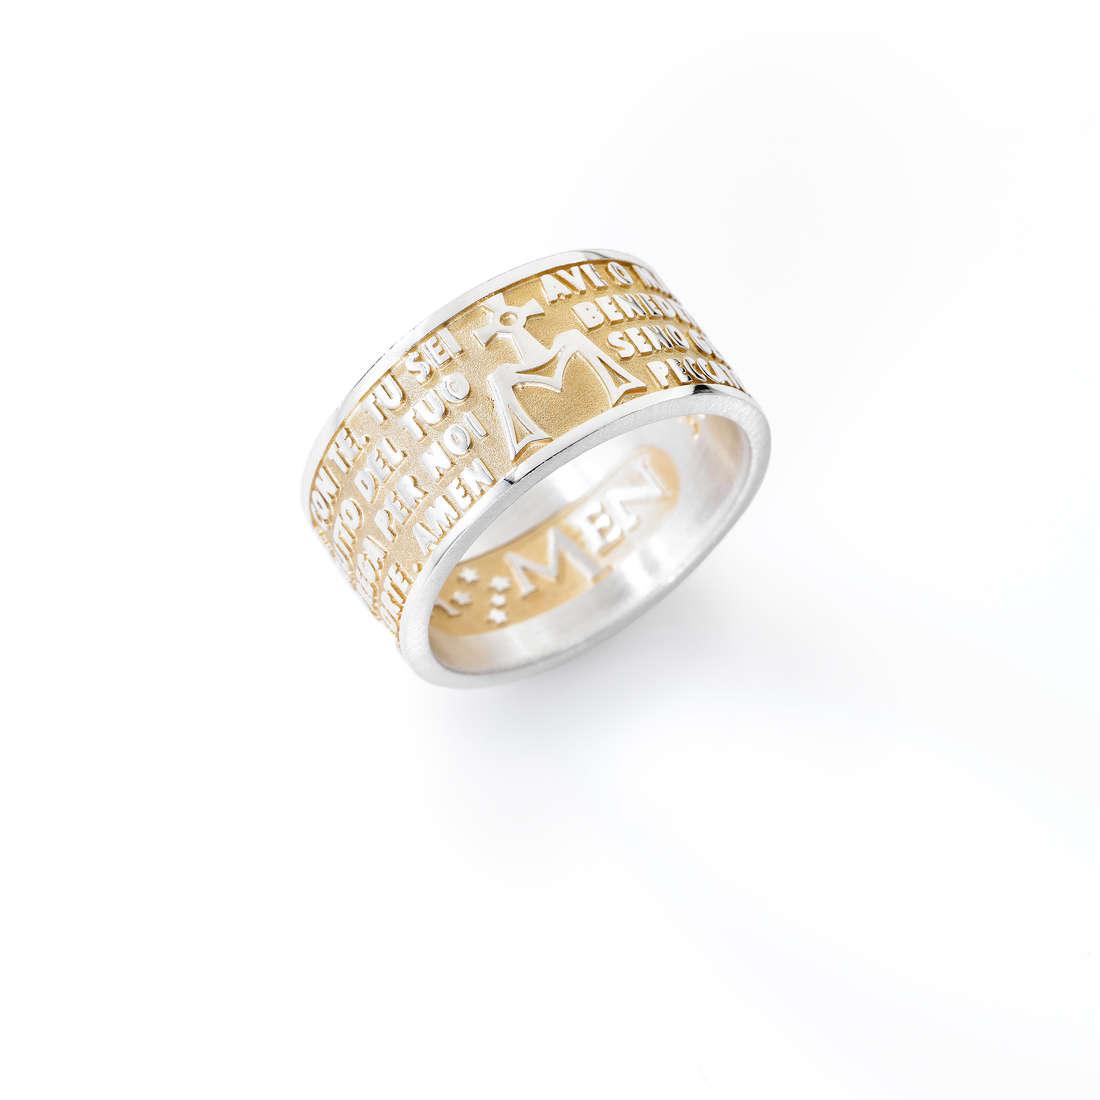 ring unisex jewellery Amen Ave Maria AMG-14